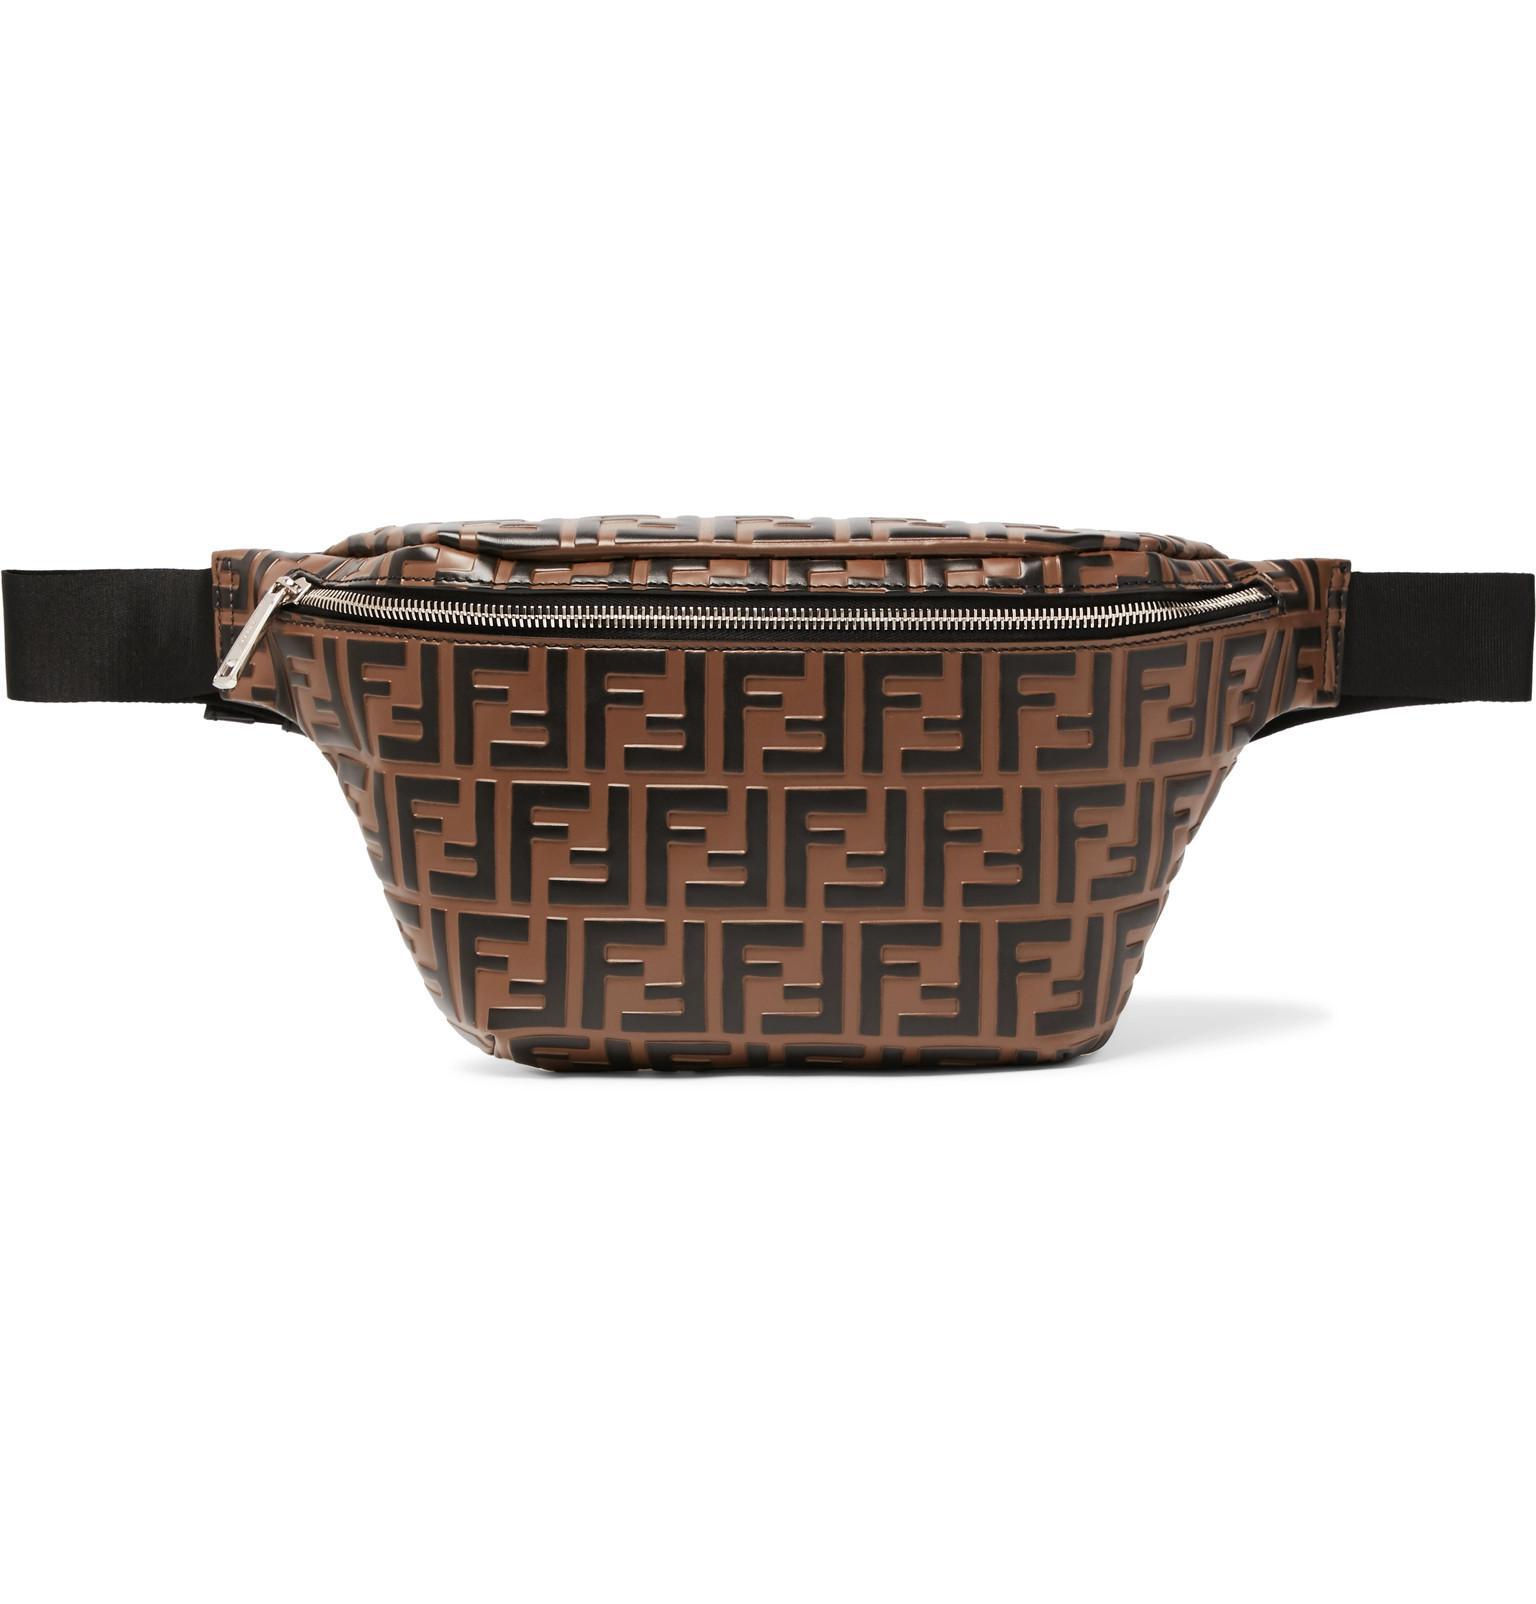 38737355c741 Lyst - Fendi Ff Print Leather Belt Bag in Brown for Men